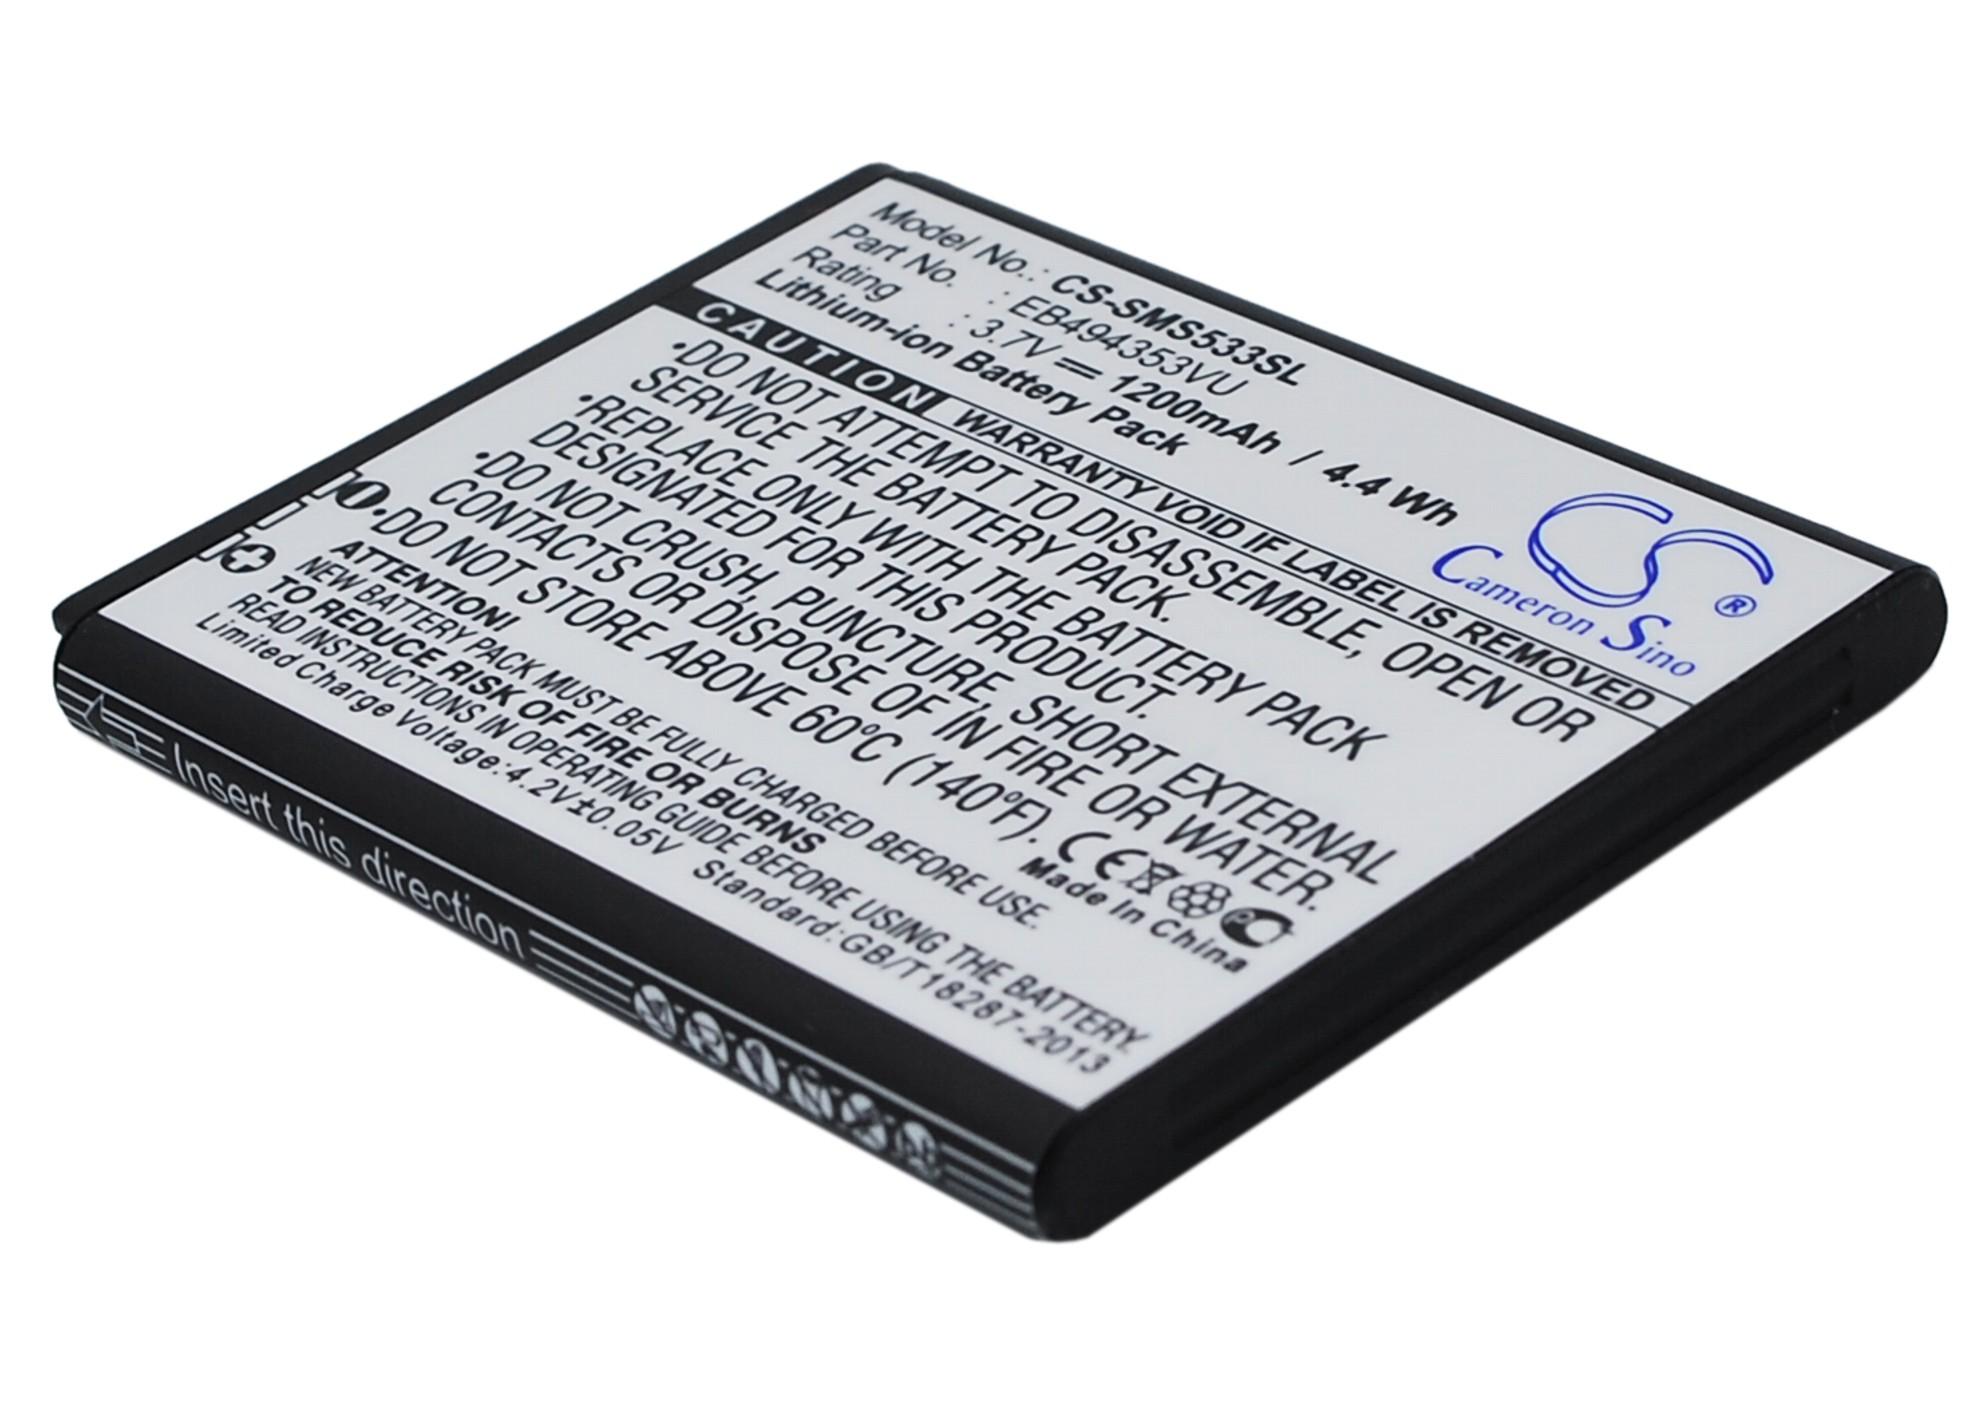 Cameron Sino baterie do mobilů pro SAMSUNG Galaxy S Wi-Fi 4.0 3.7V Li-ion 1200mAh černá - neoriginální